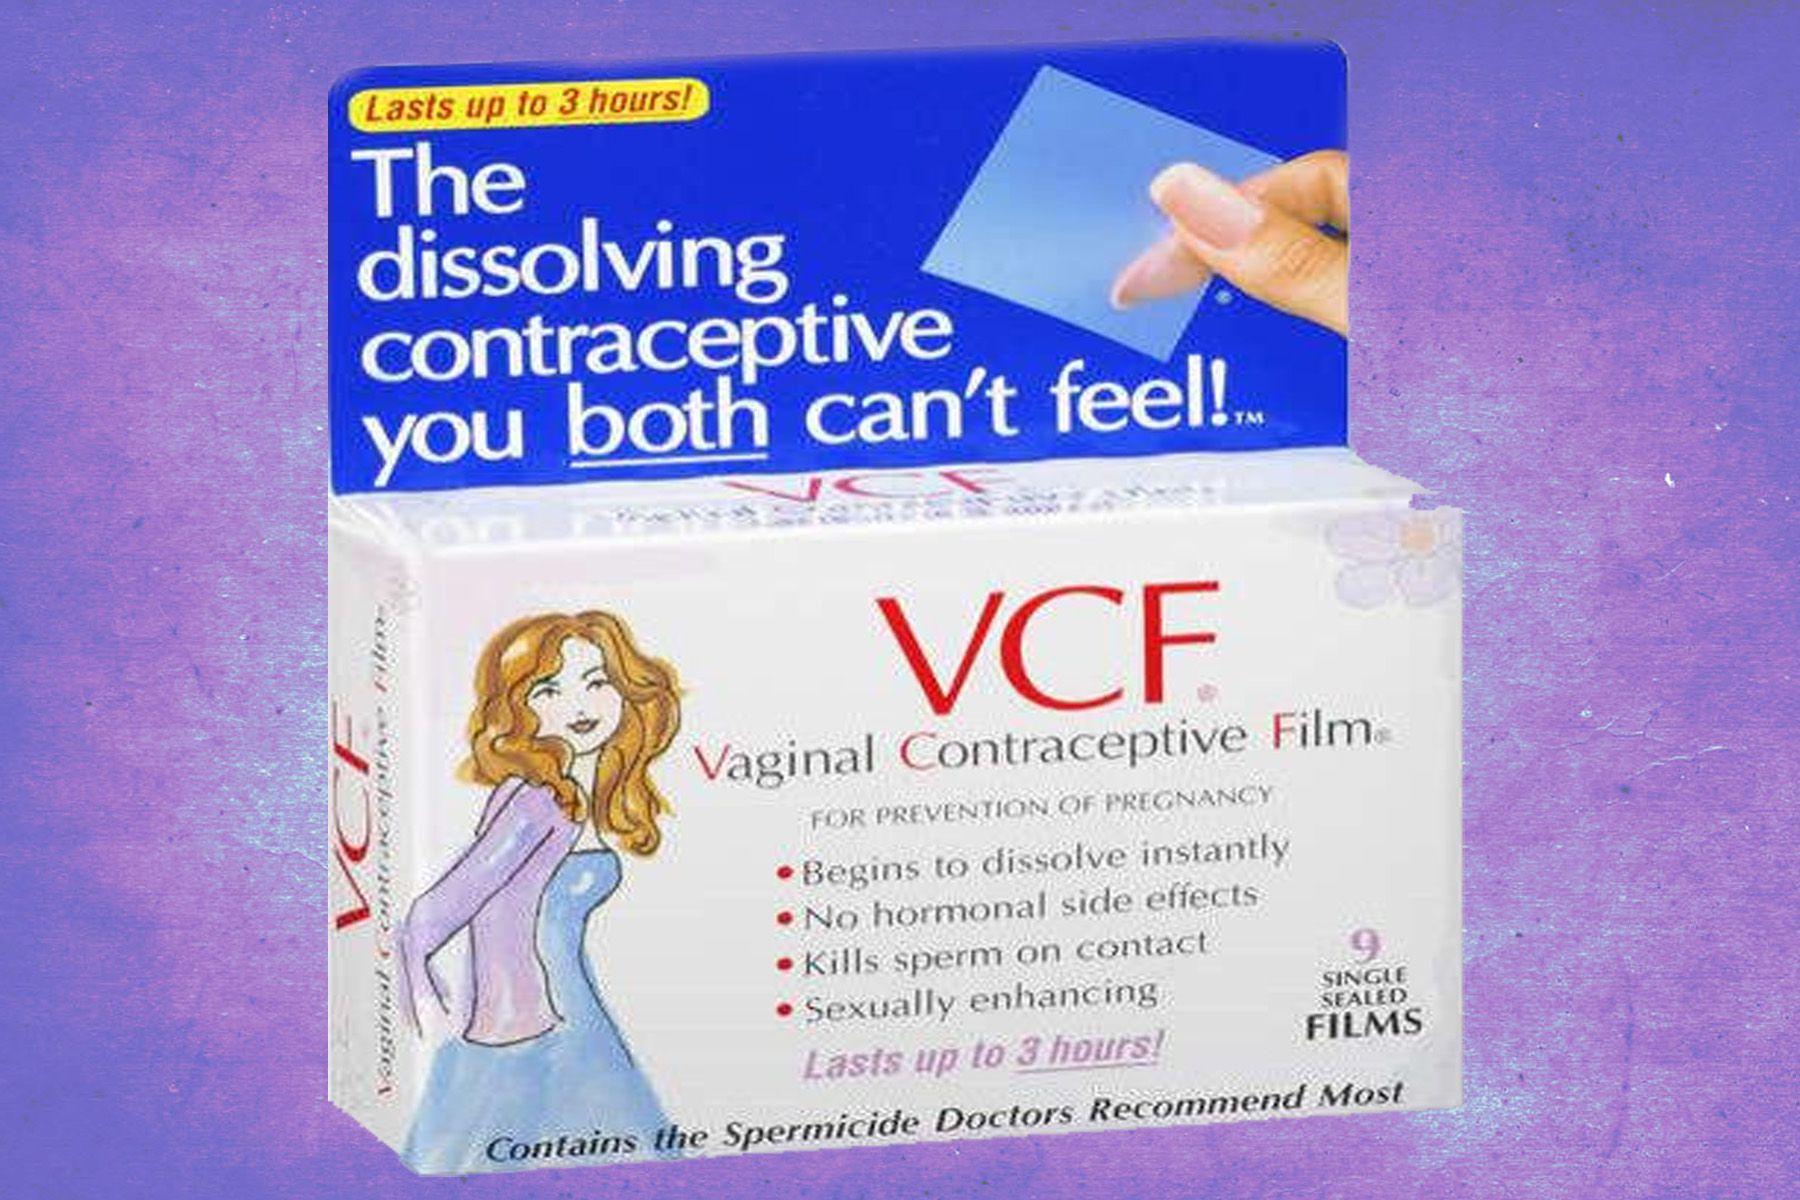 Vagina Filme